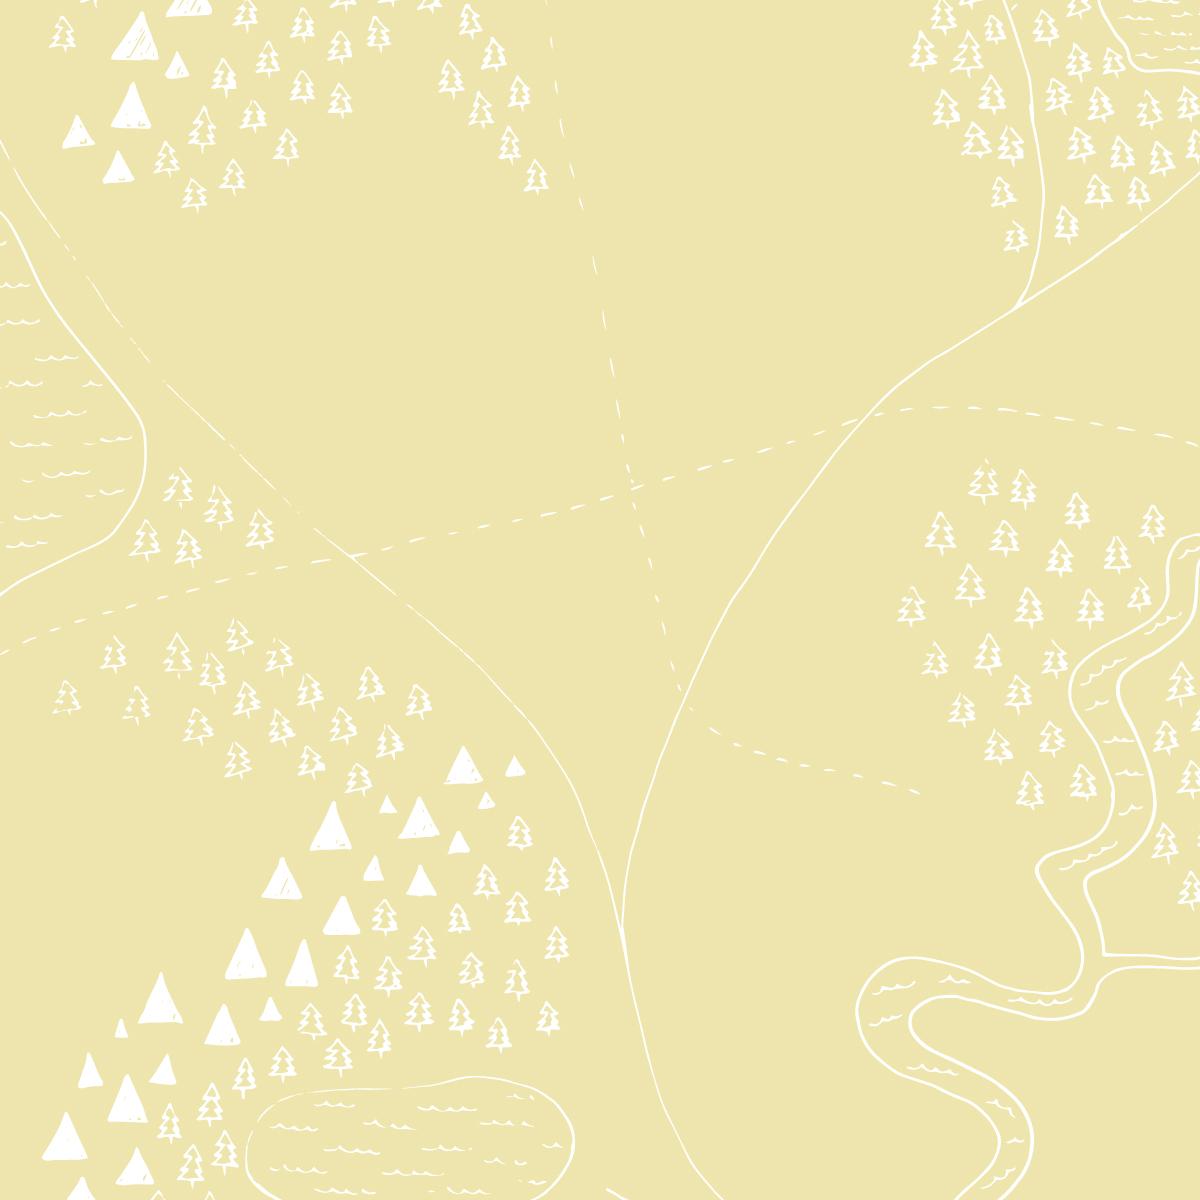 Map Patterns-03.jpg